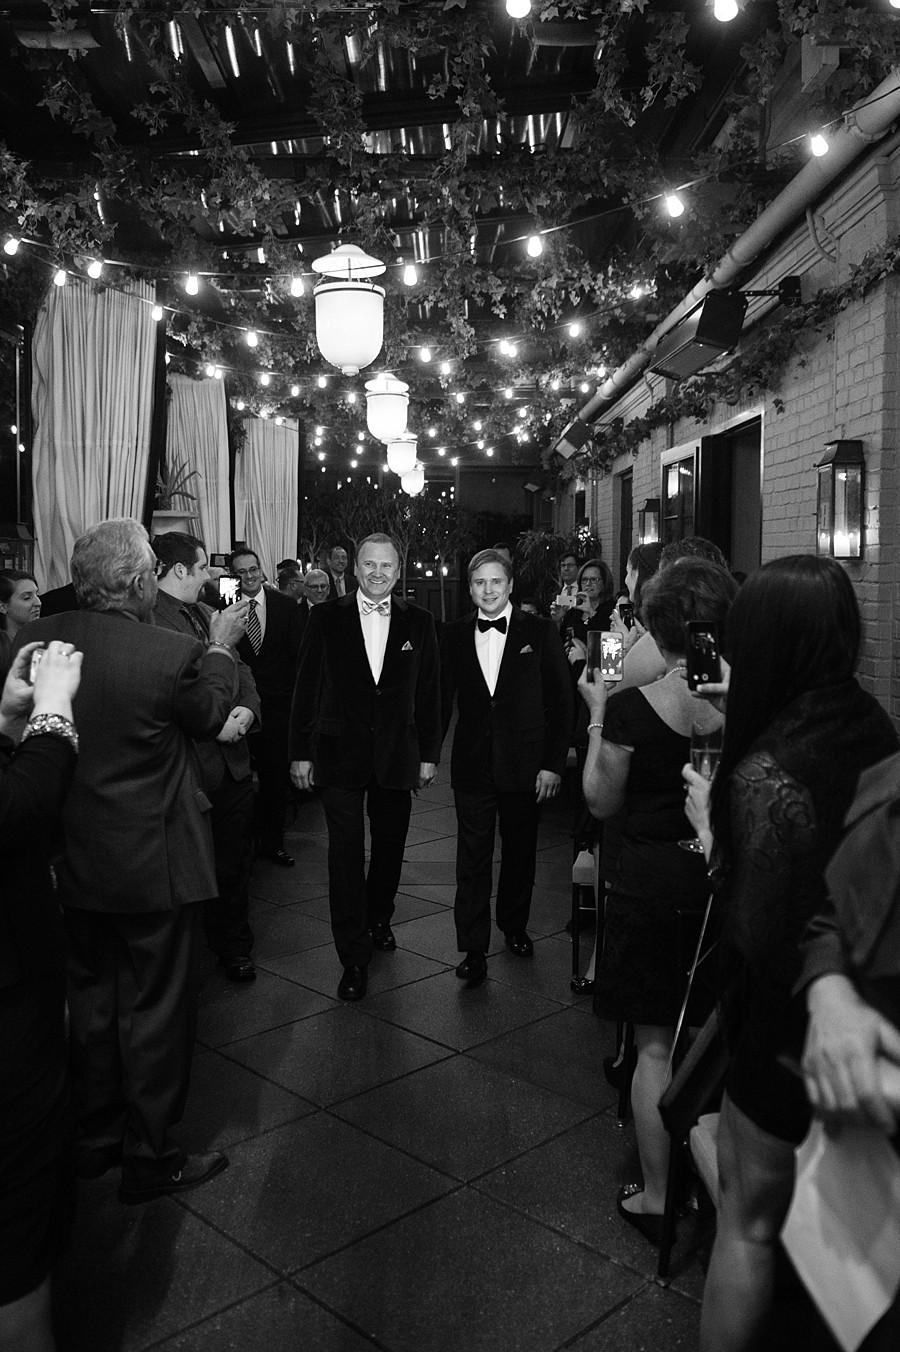 Gramercy_Park_Hotel_Wedding_NYC_FS_22.jpg